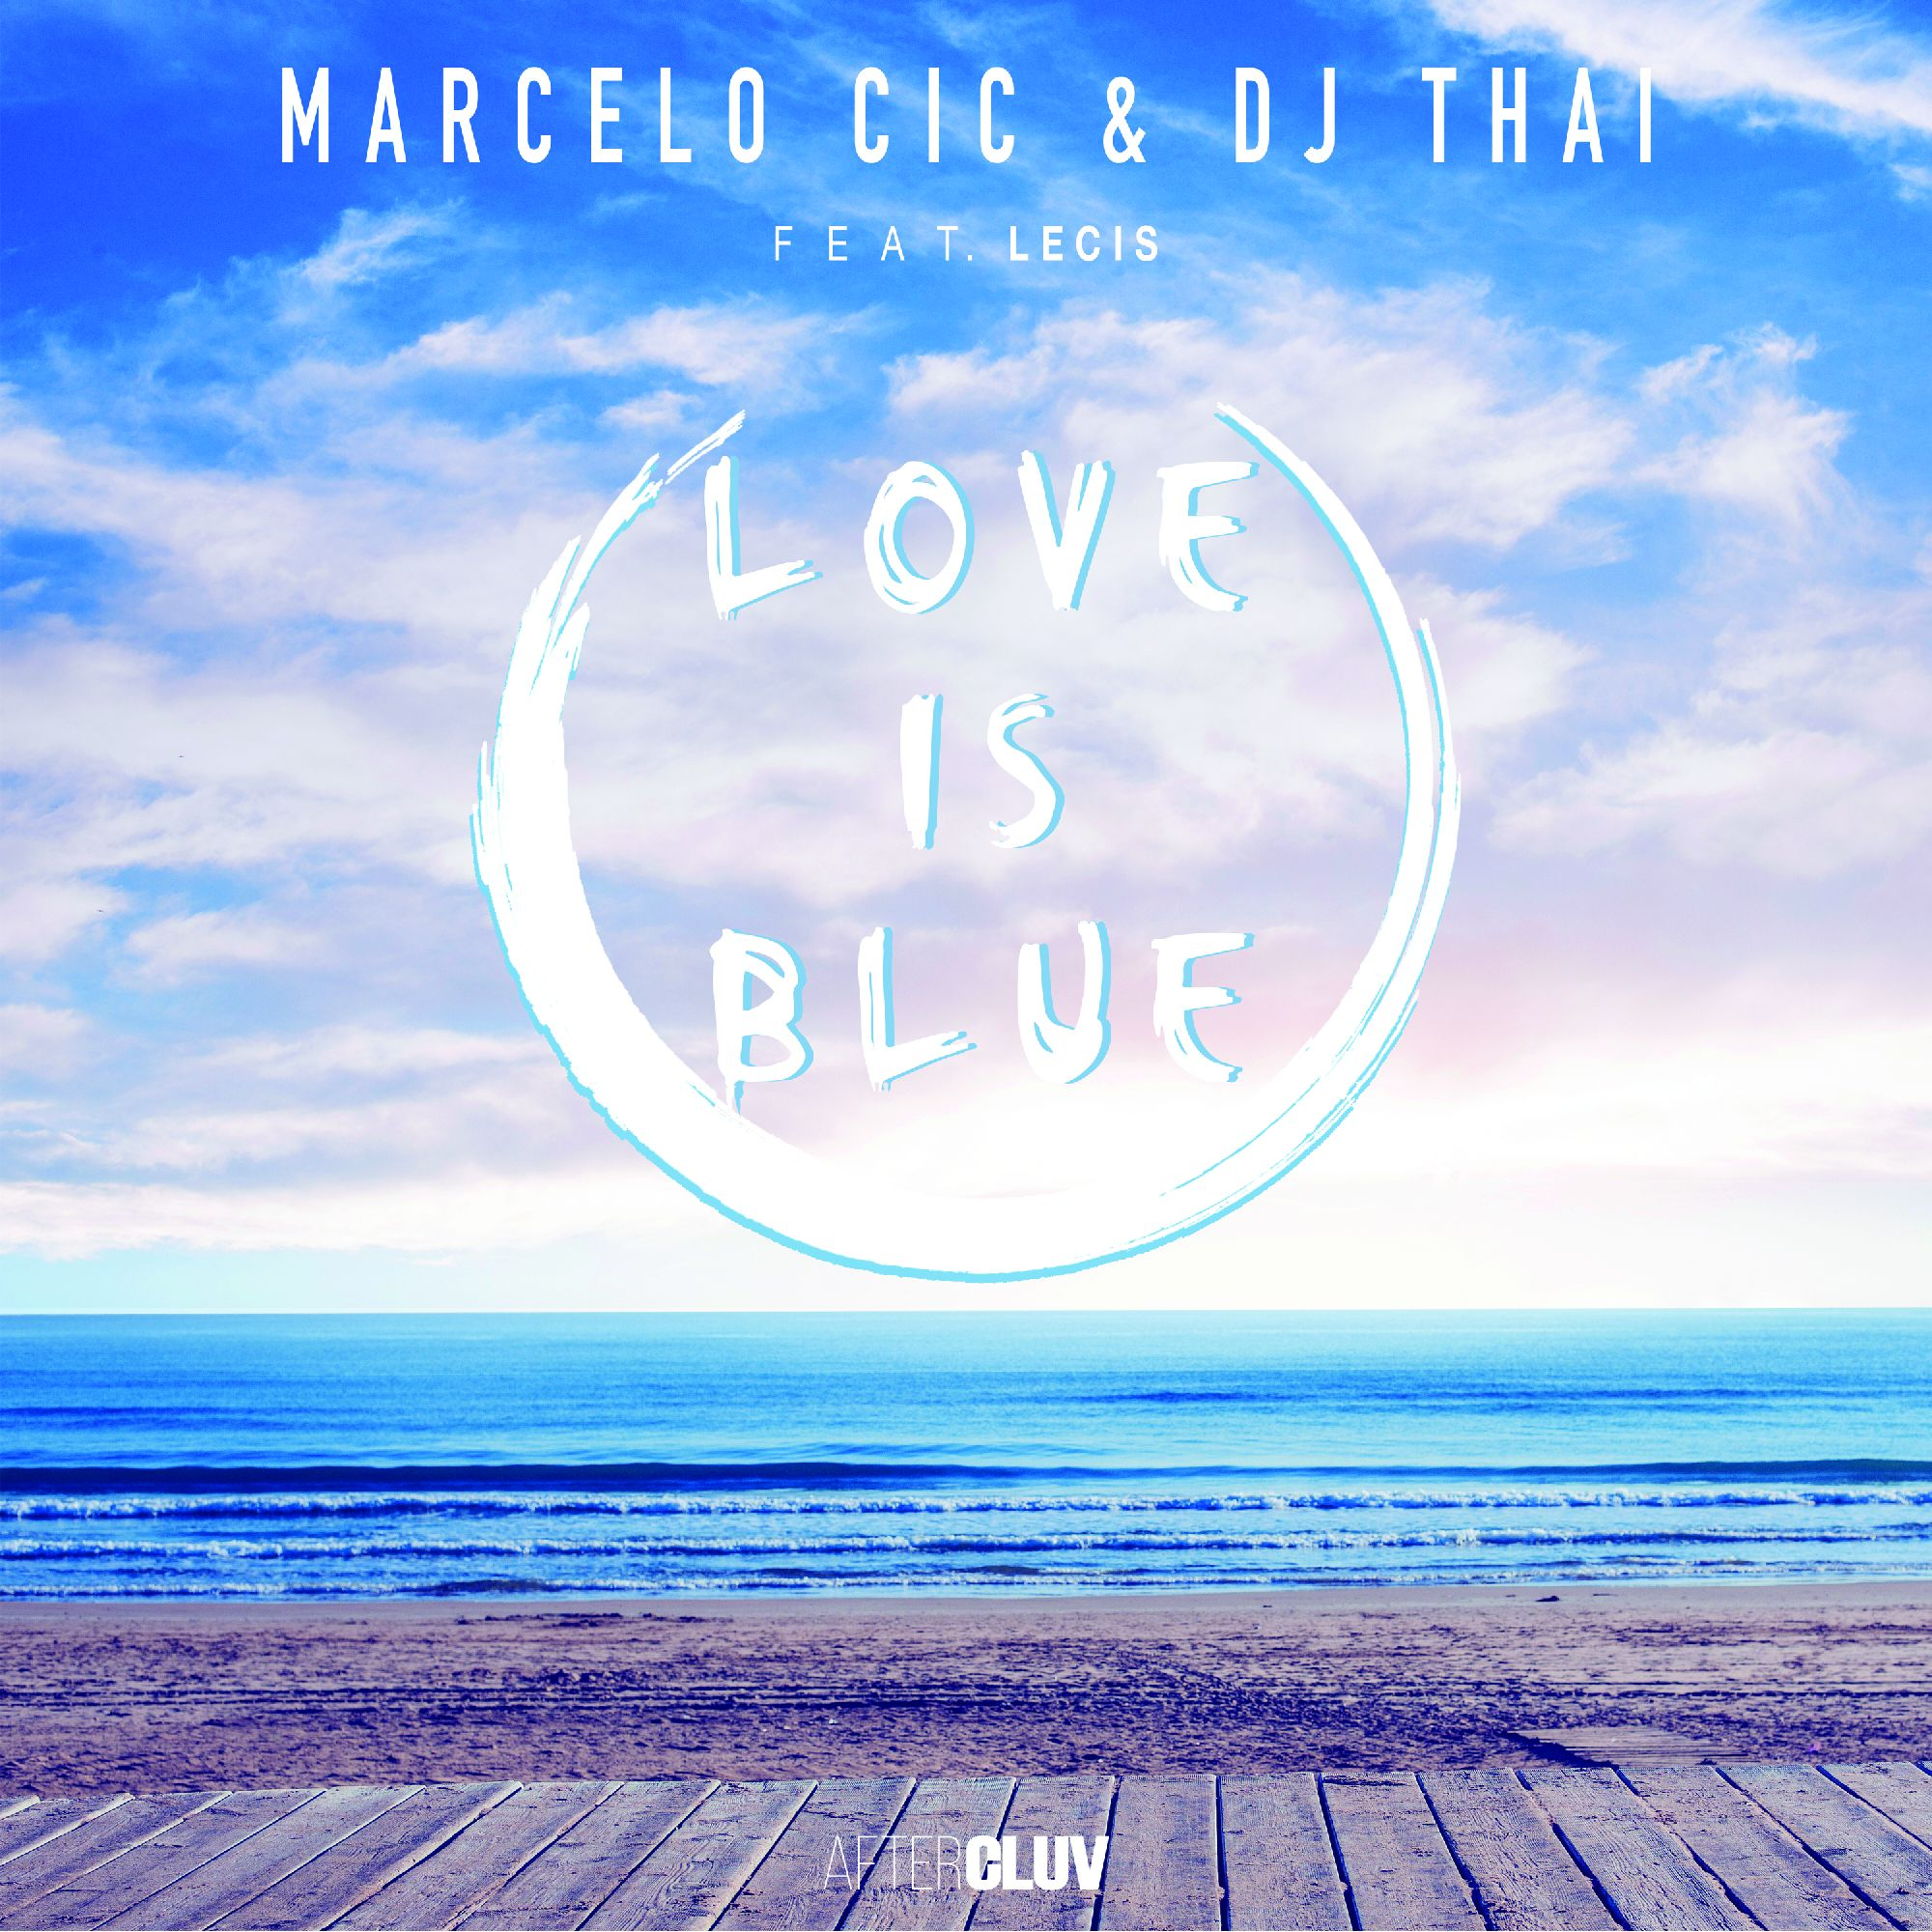 MARCELO CIC & DJ THAI - LOVE IS BLUE FEAT. LECIS